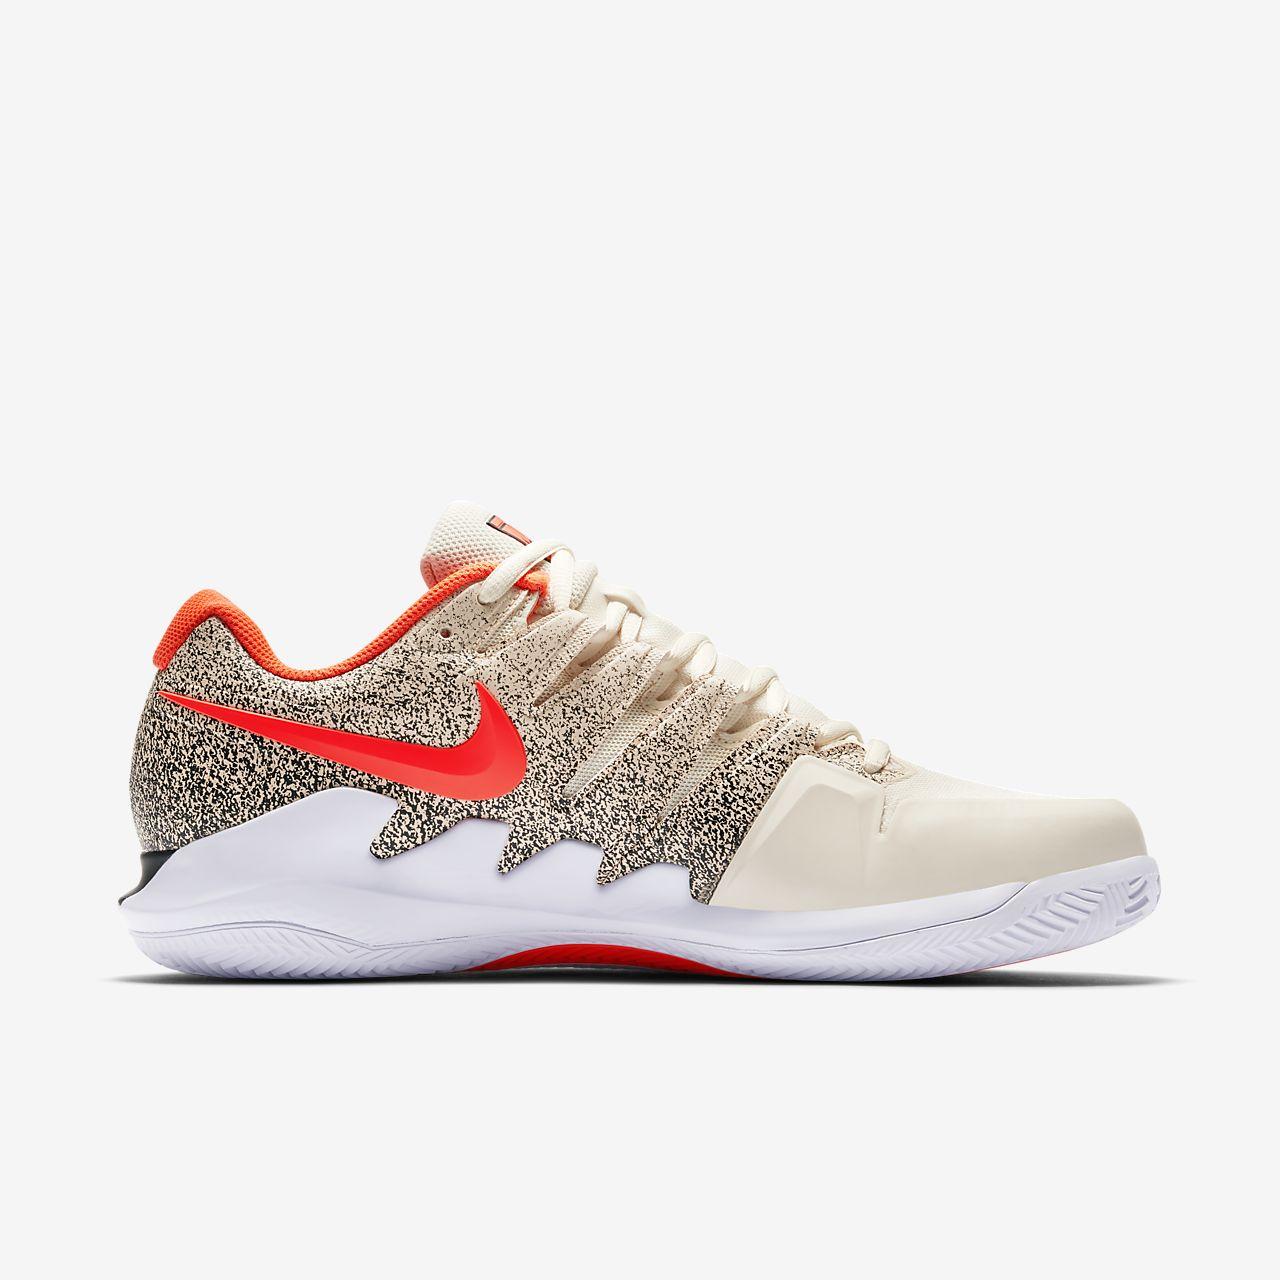 Nike air zoom vapor x clay Nike eYKvdgnP1x